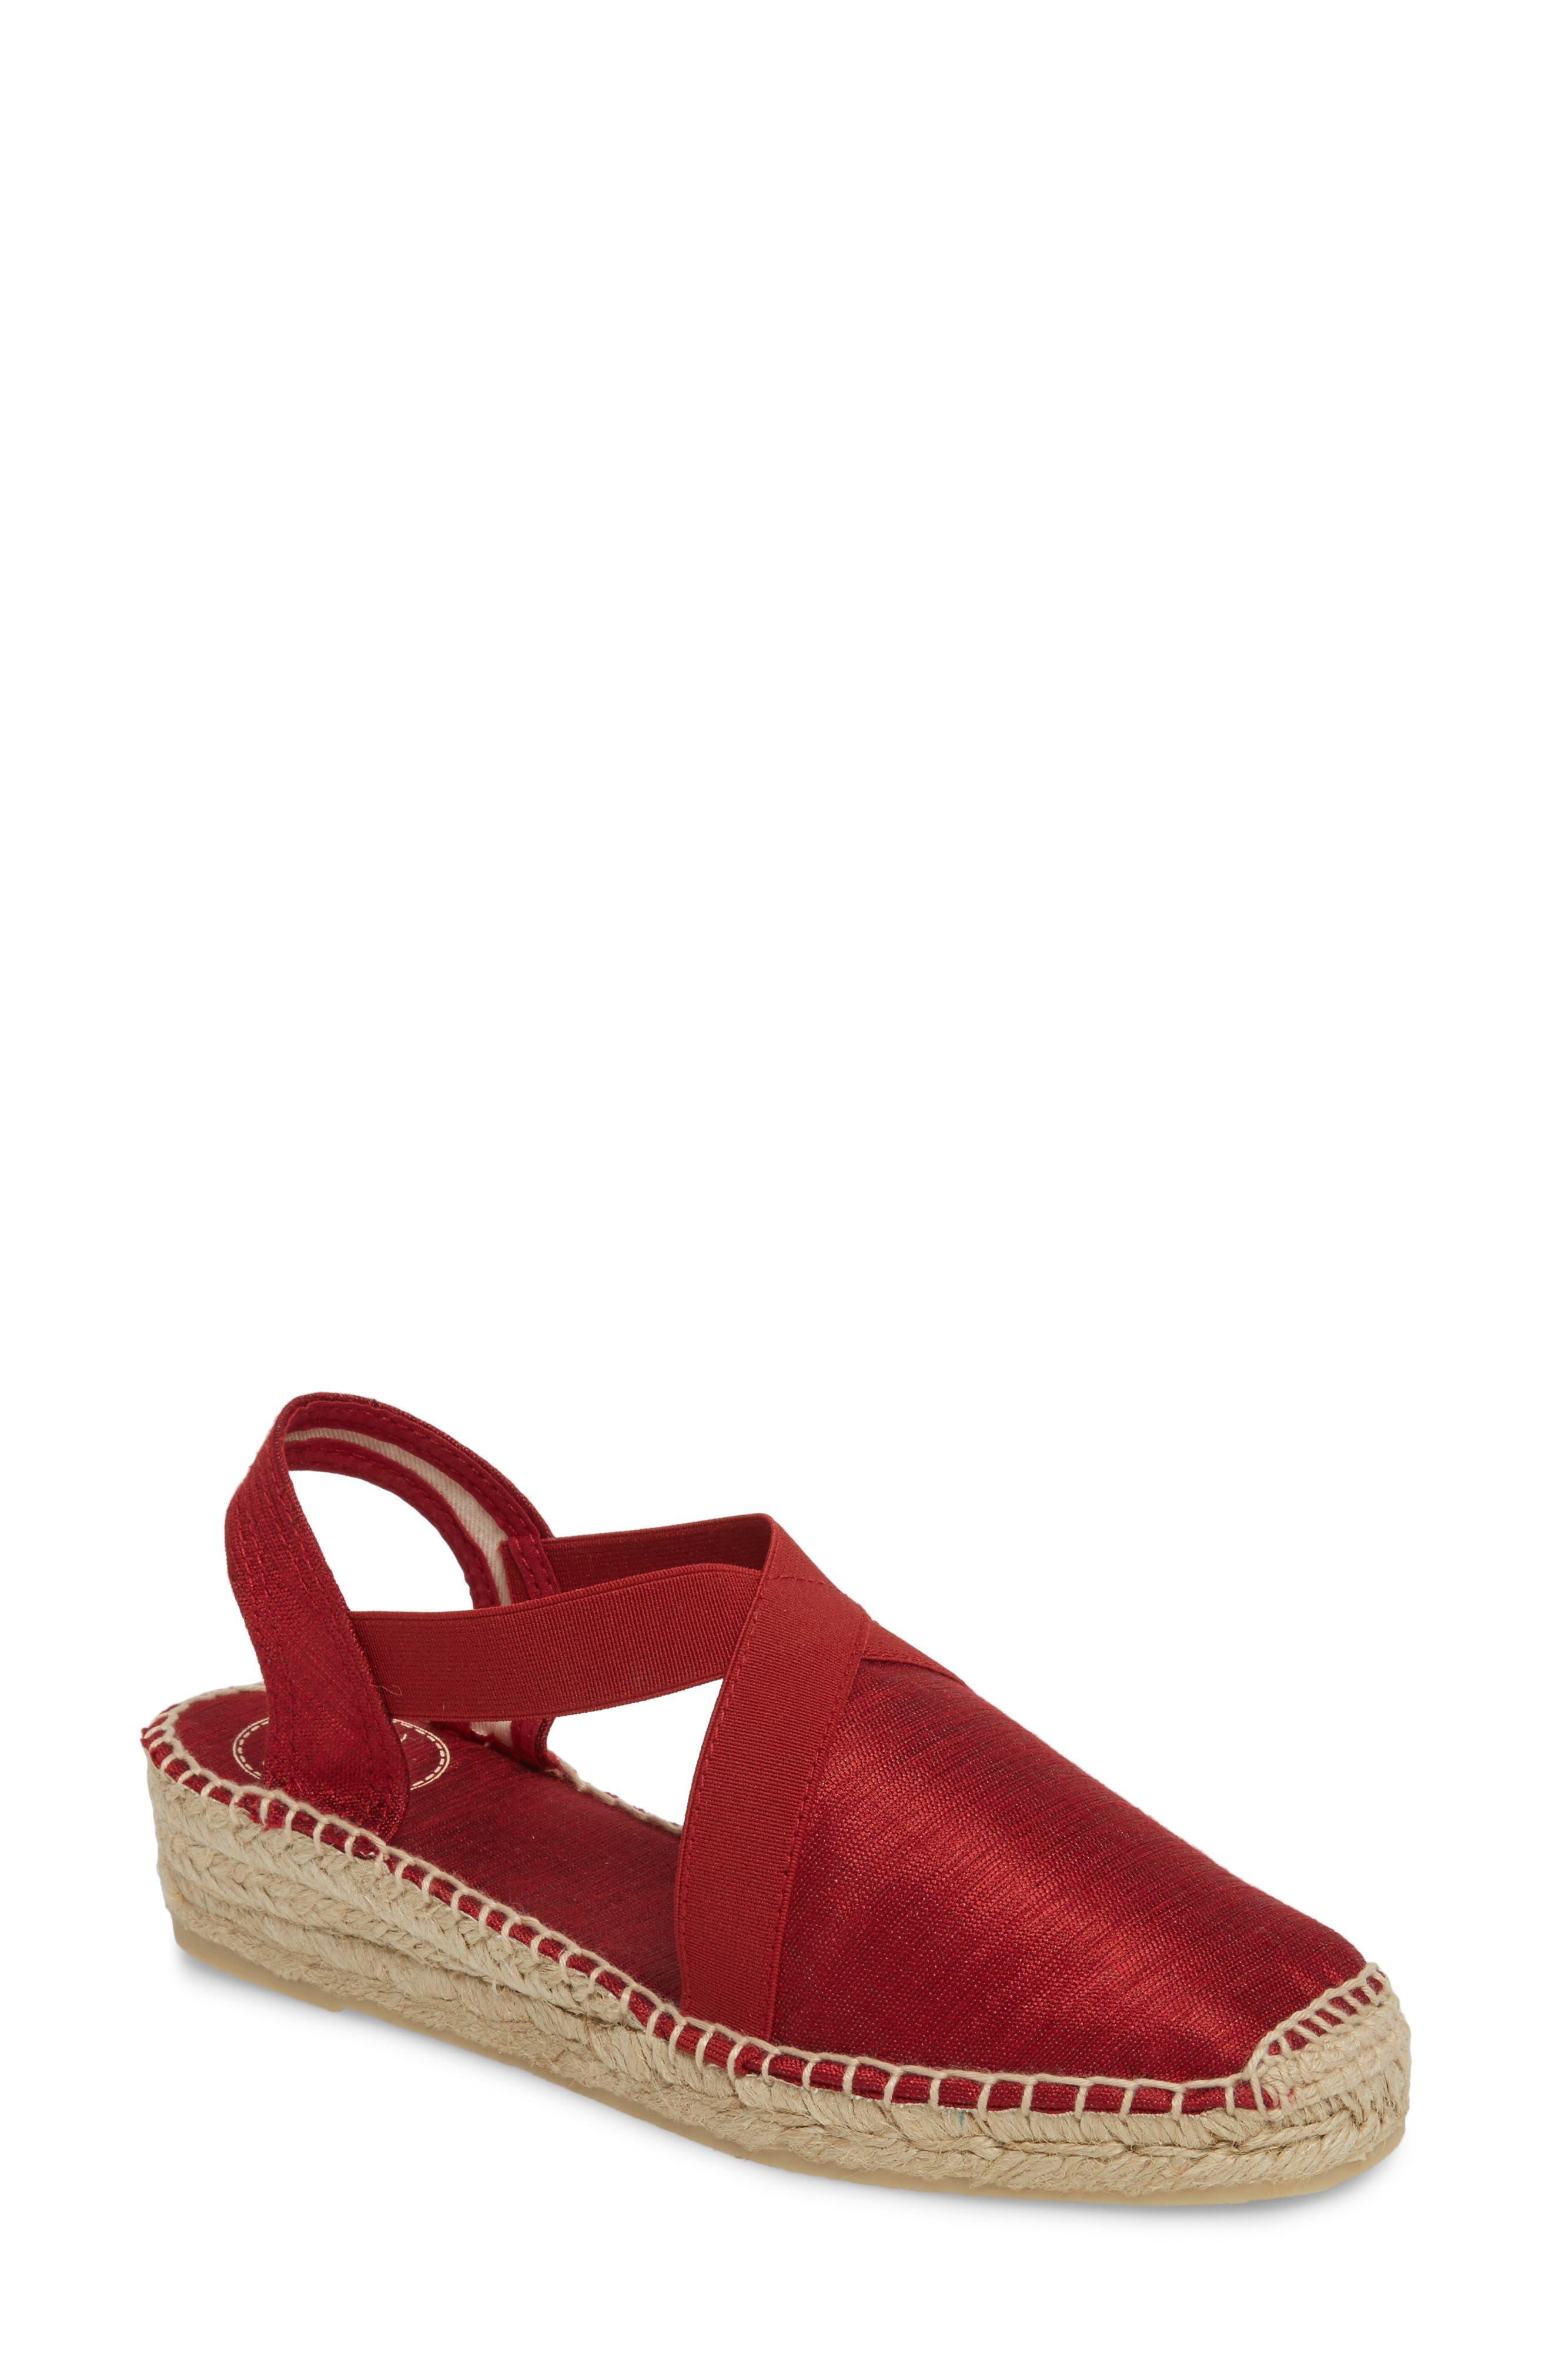 'Vic' Espadrille Slingback Sandal,                         Main,                         color, Red Fabric